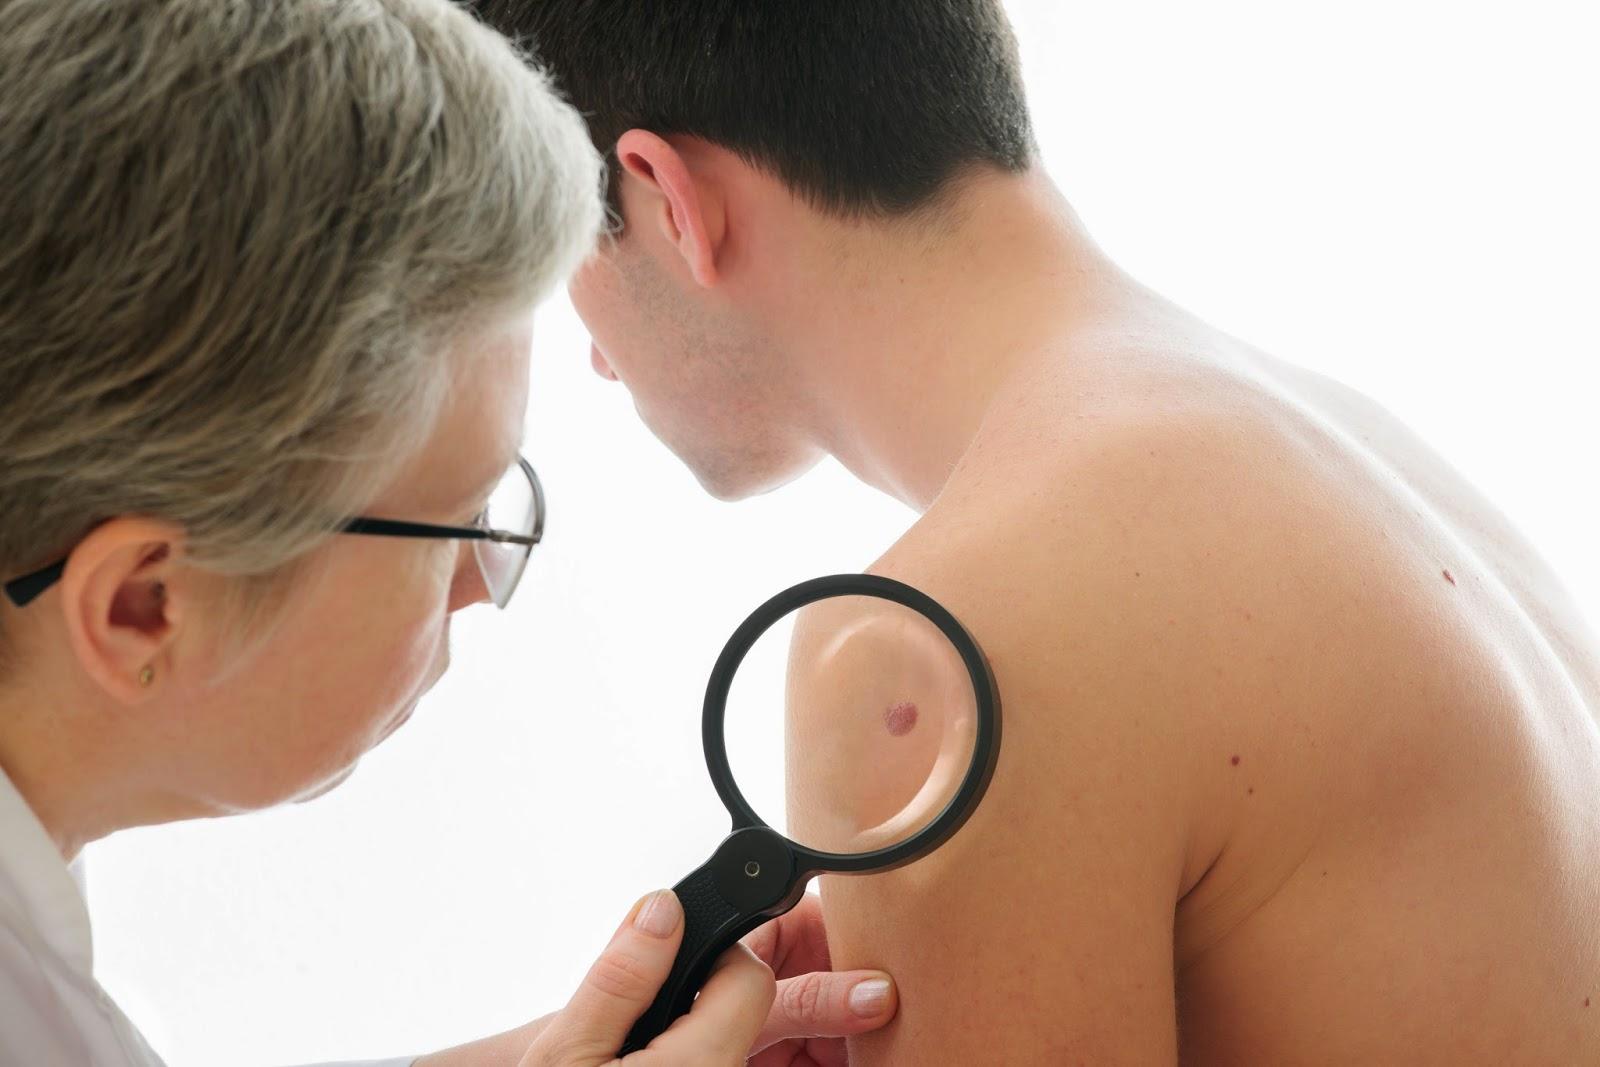 Myriad myPath Melanoma improves the diagnosis and treatment  plans of melanoma.